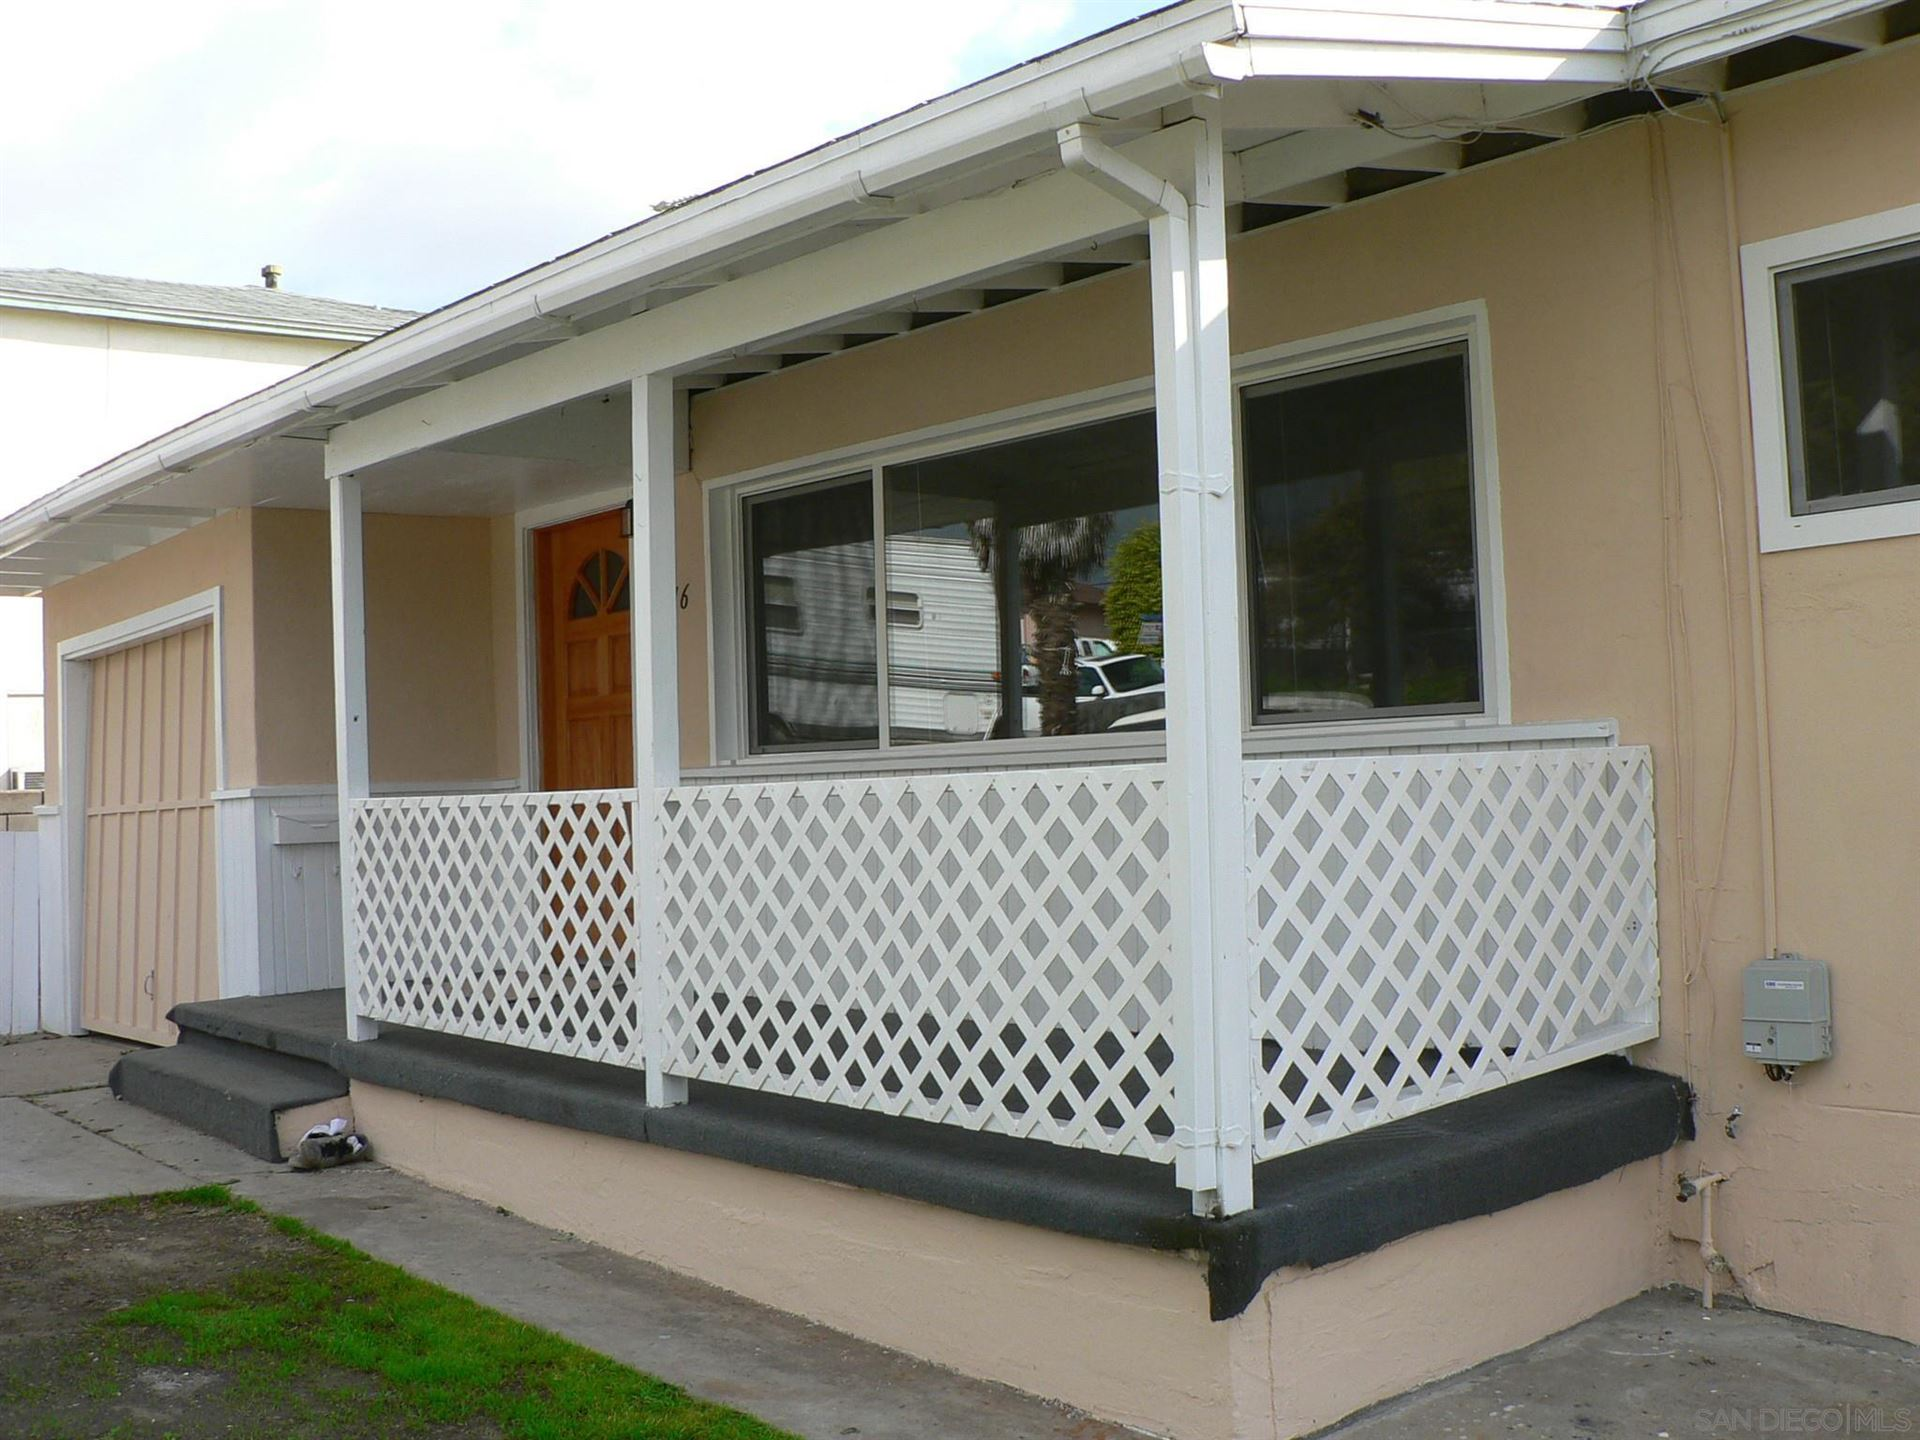 Photo of 1776 Elroy Dr, Lemon Grove, CA 91945 (MLS # 210028432)